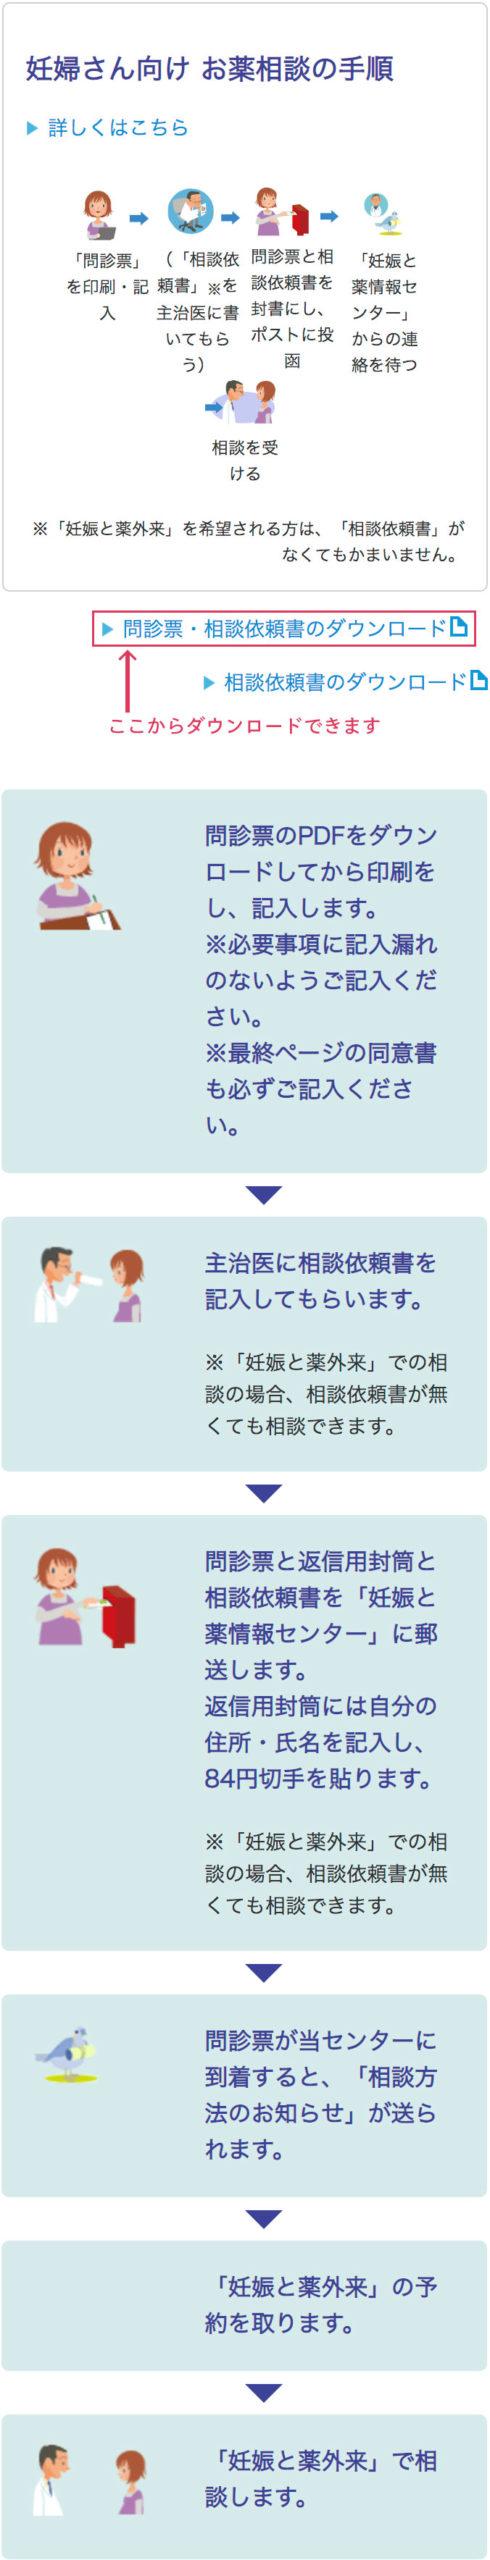 ninshin_sp